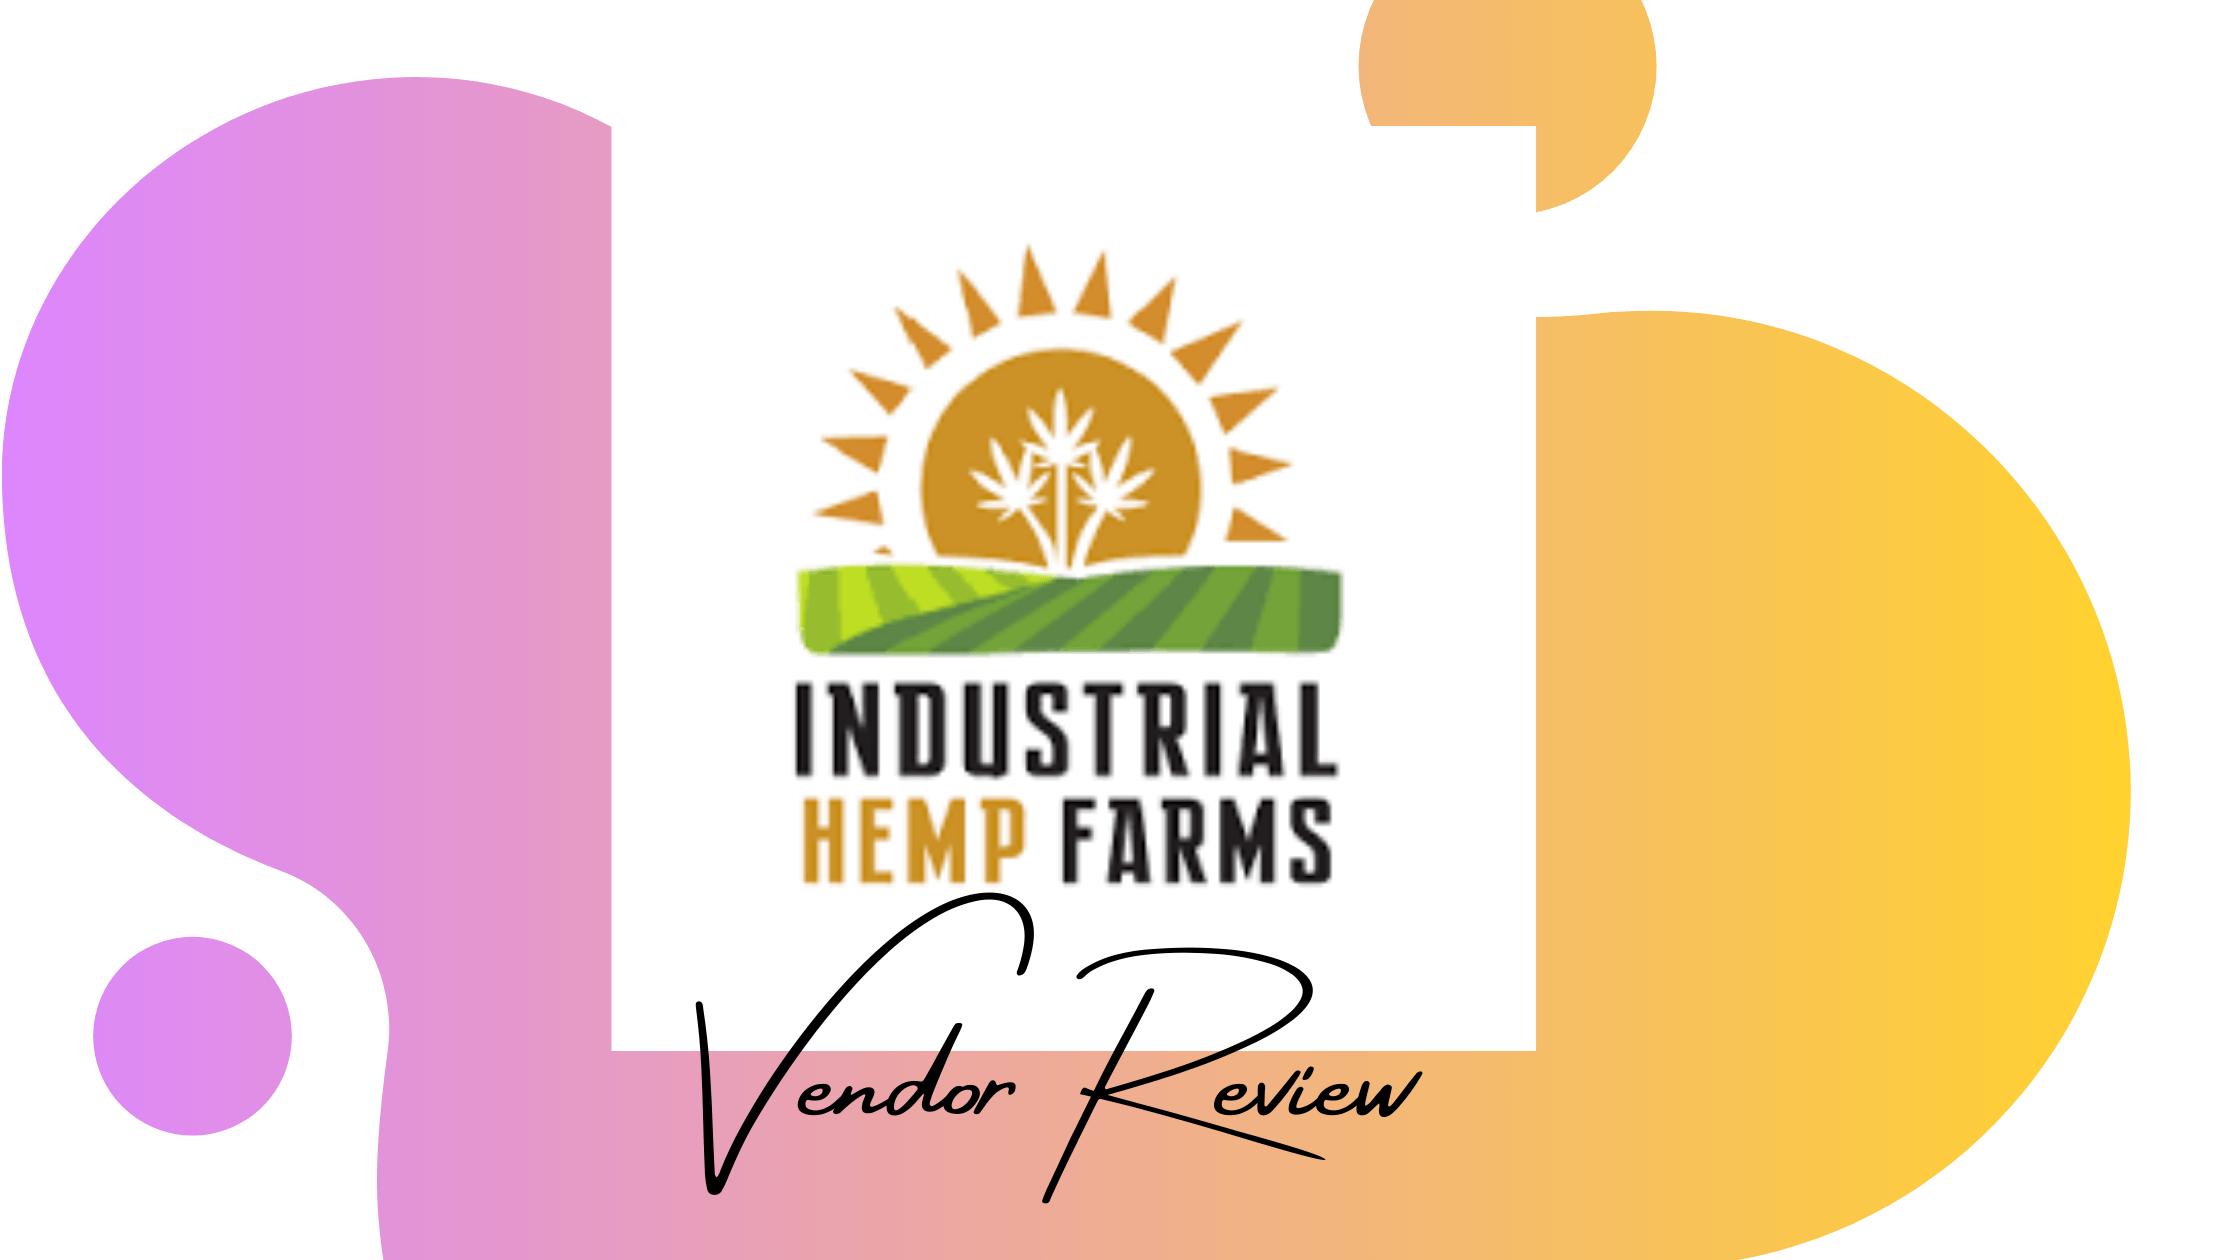 Industrial Hemp Farms Vendor Review